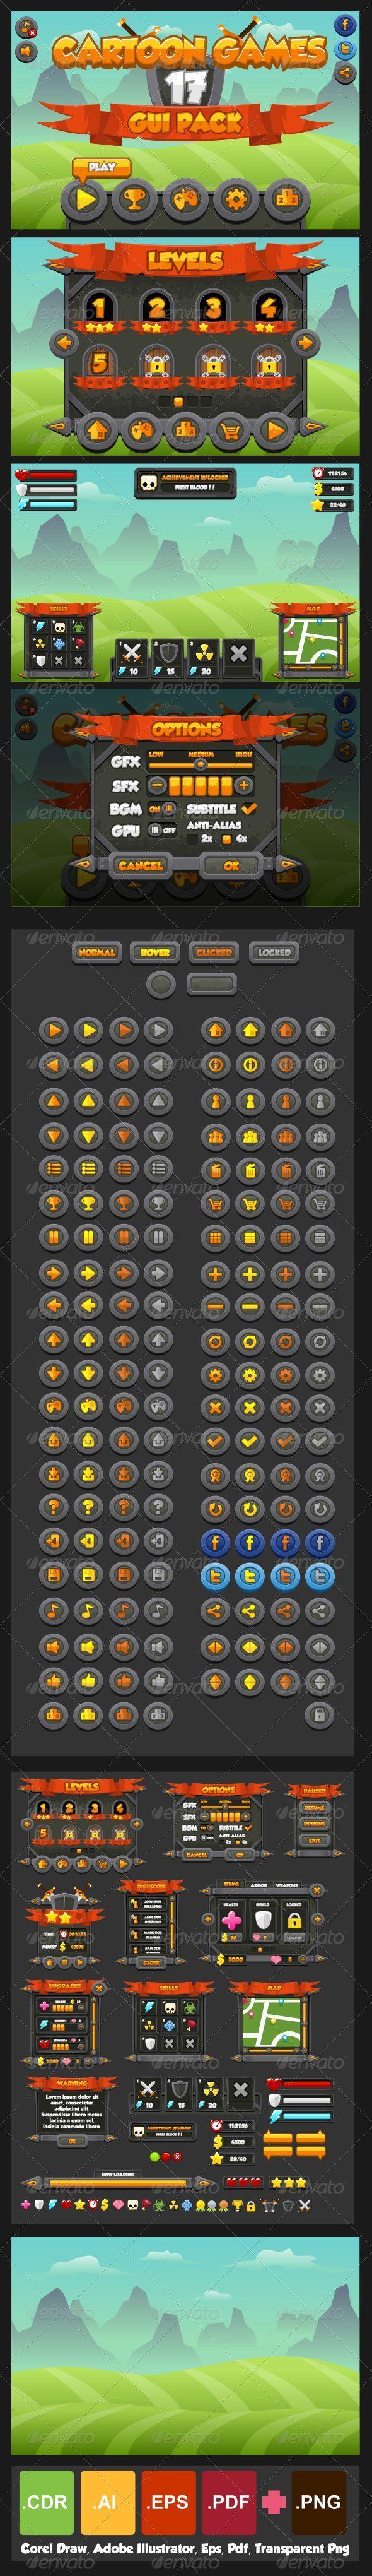 GraphicRiver Cartoon Games GUI Pack 17 7829900